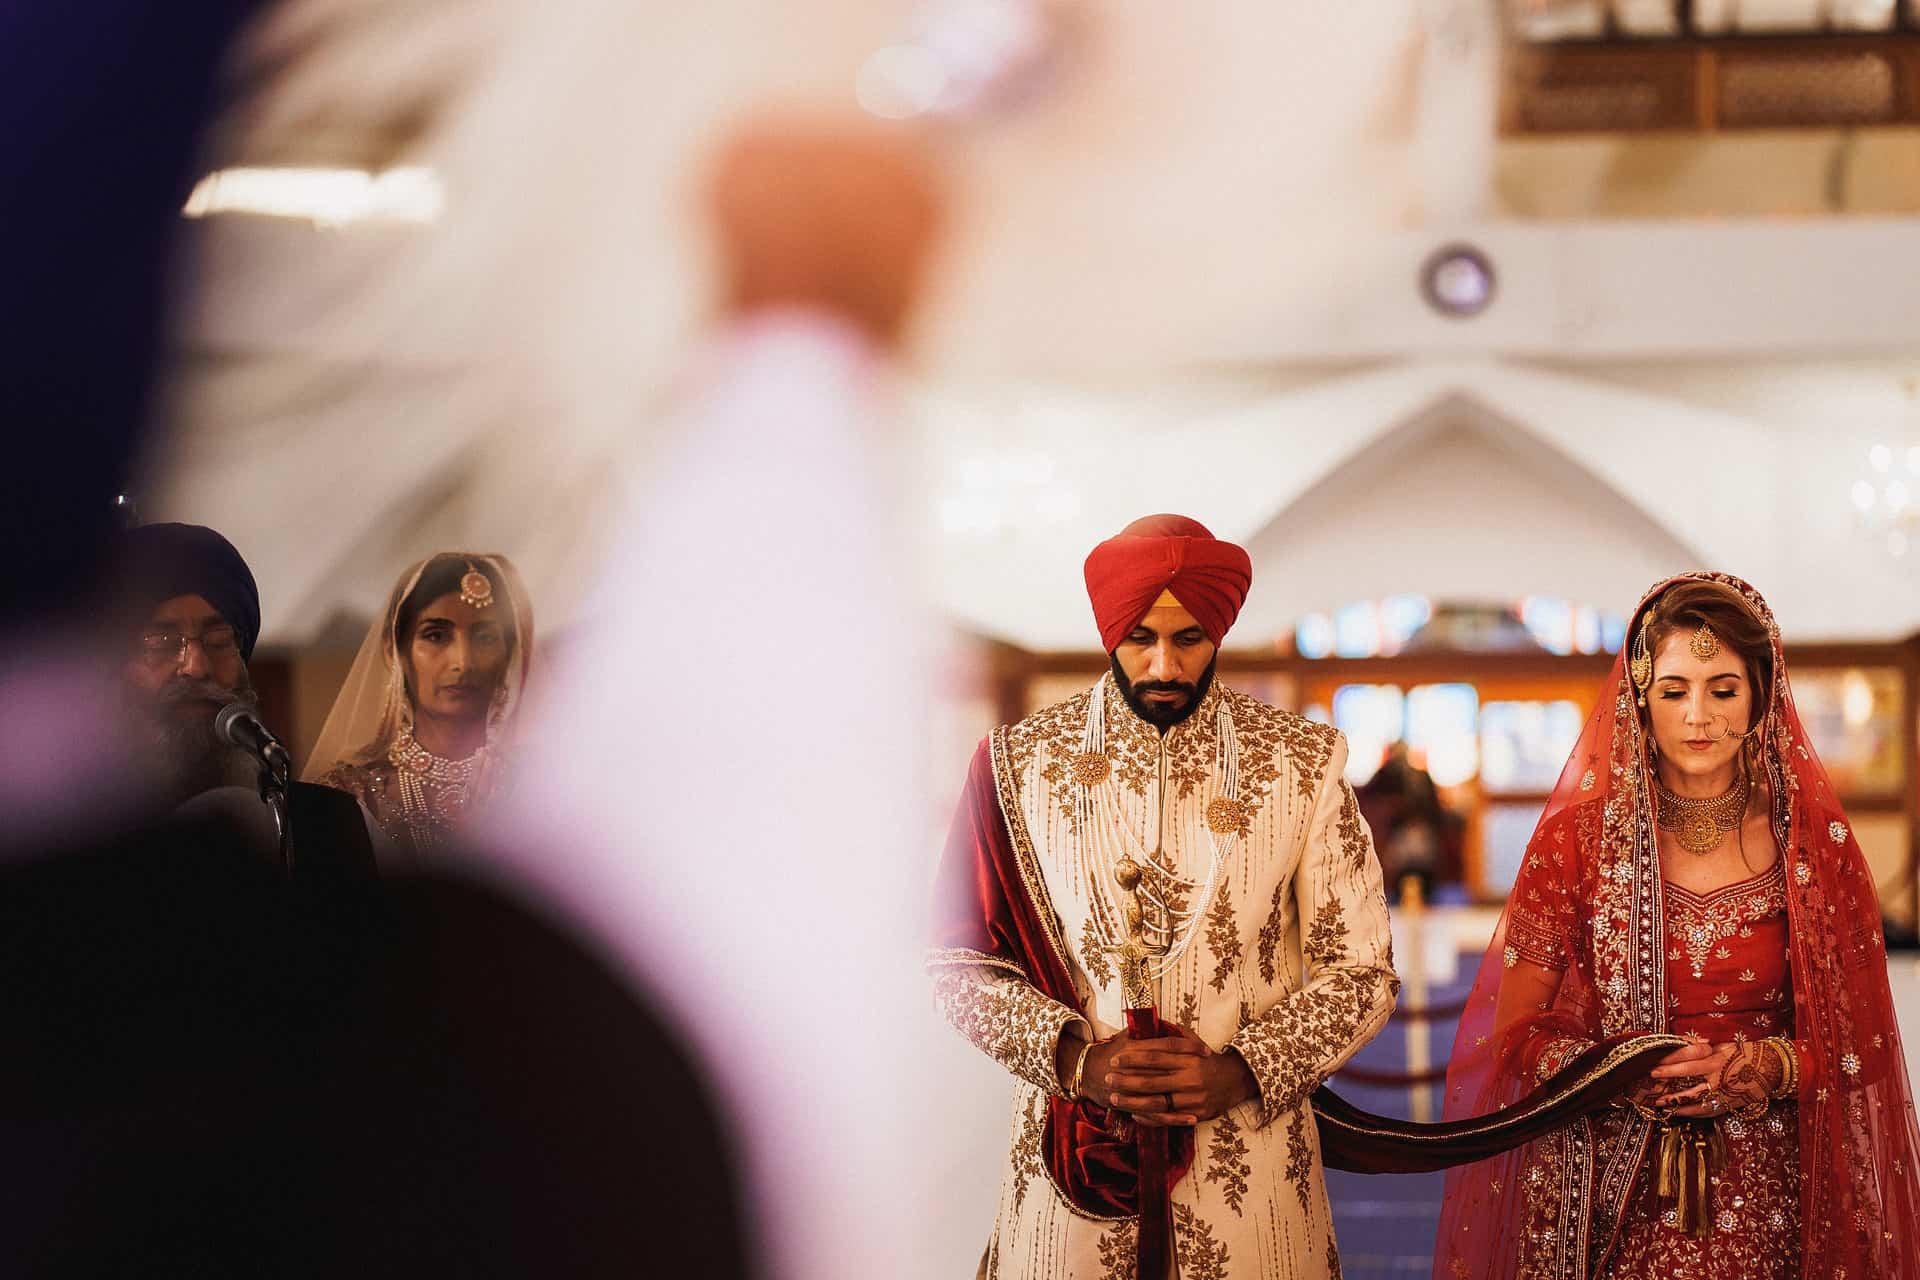 best london uk wedding photographer 2020